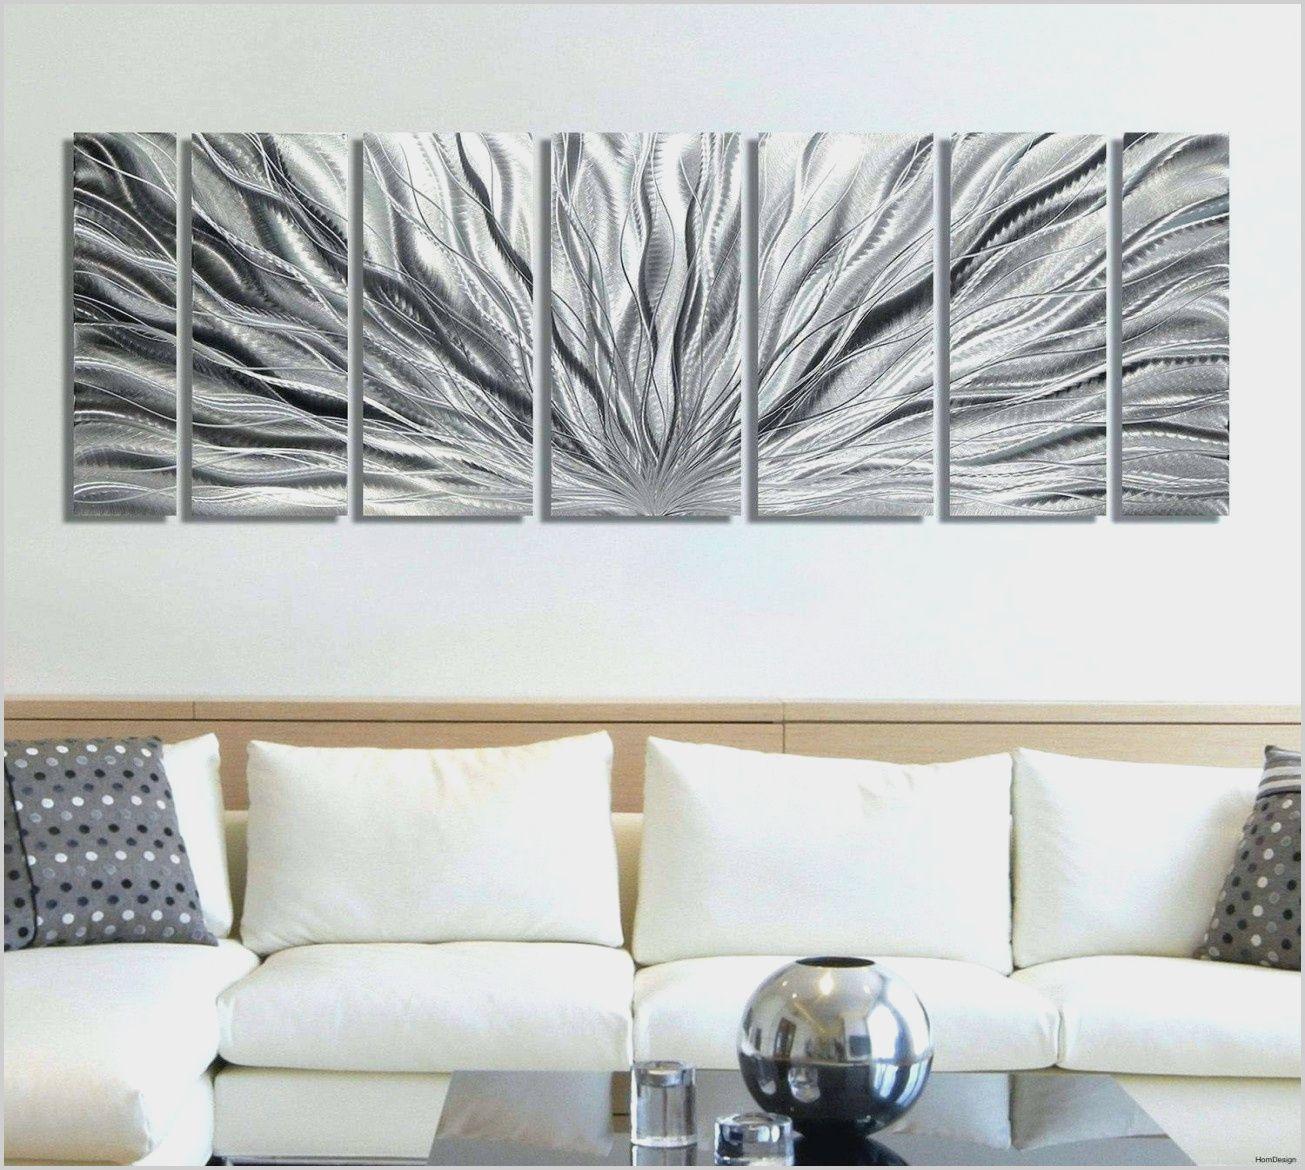 Bedroom Cnvas Art Ideas Dekorasi Dinding Kamar Mandi Dekorasi Dinding Kamar Tidur Ide Dekorasi Dinding Ruang Tamu Living room art ideas